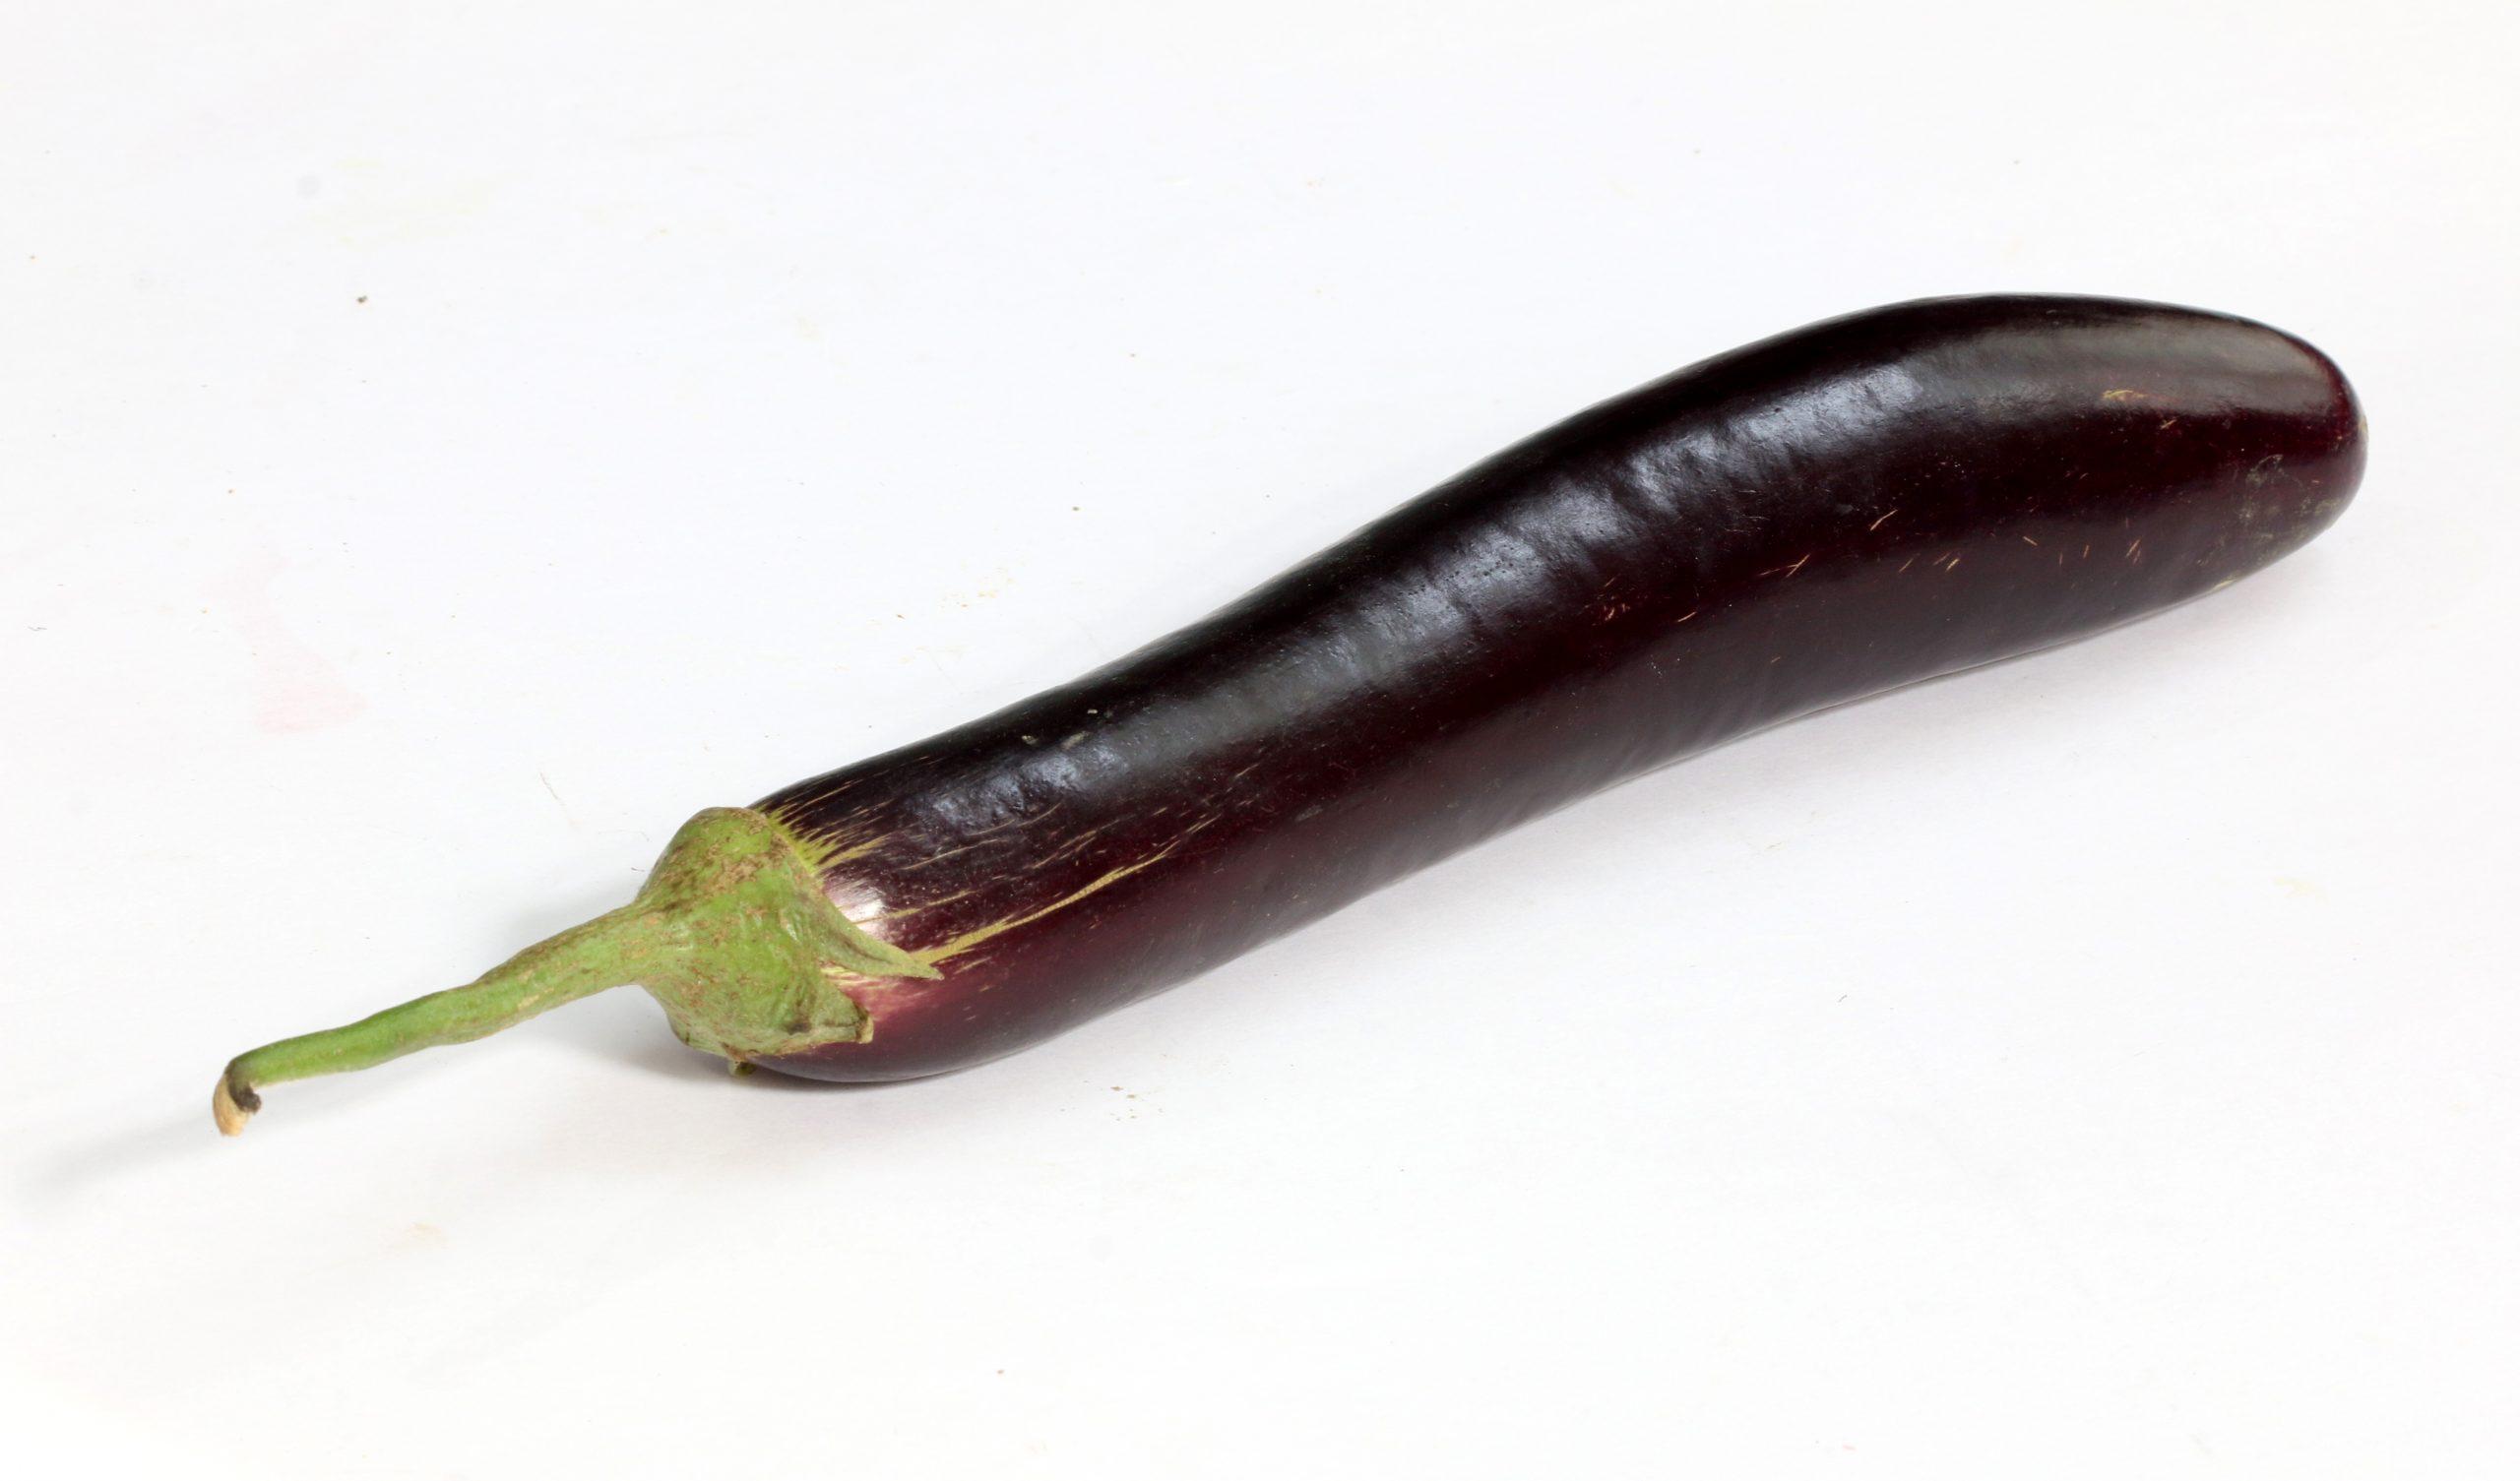 brinjal vegetable